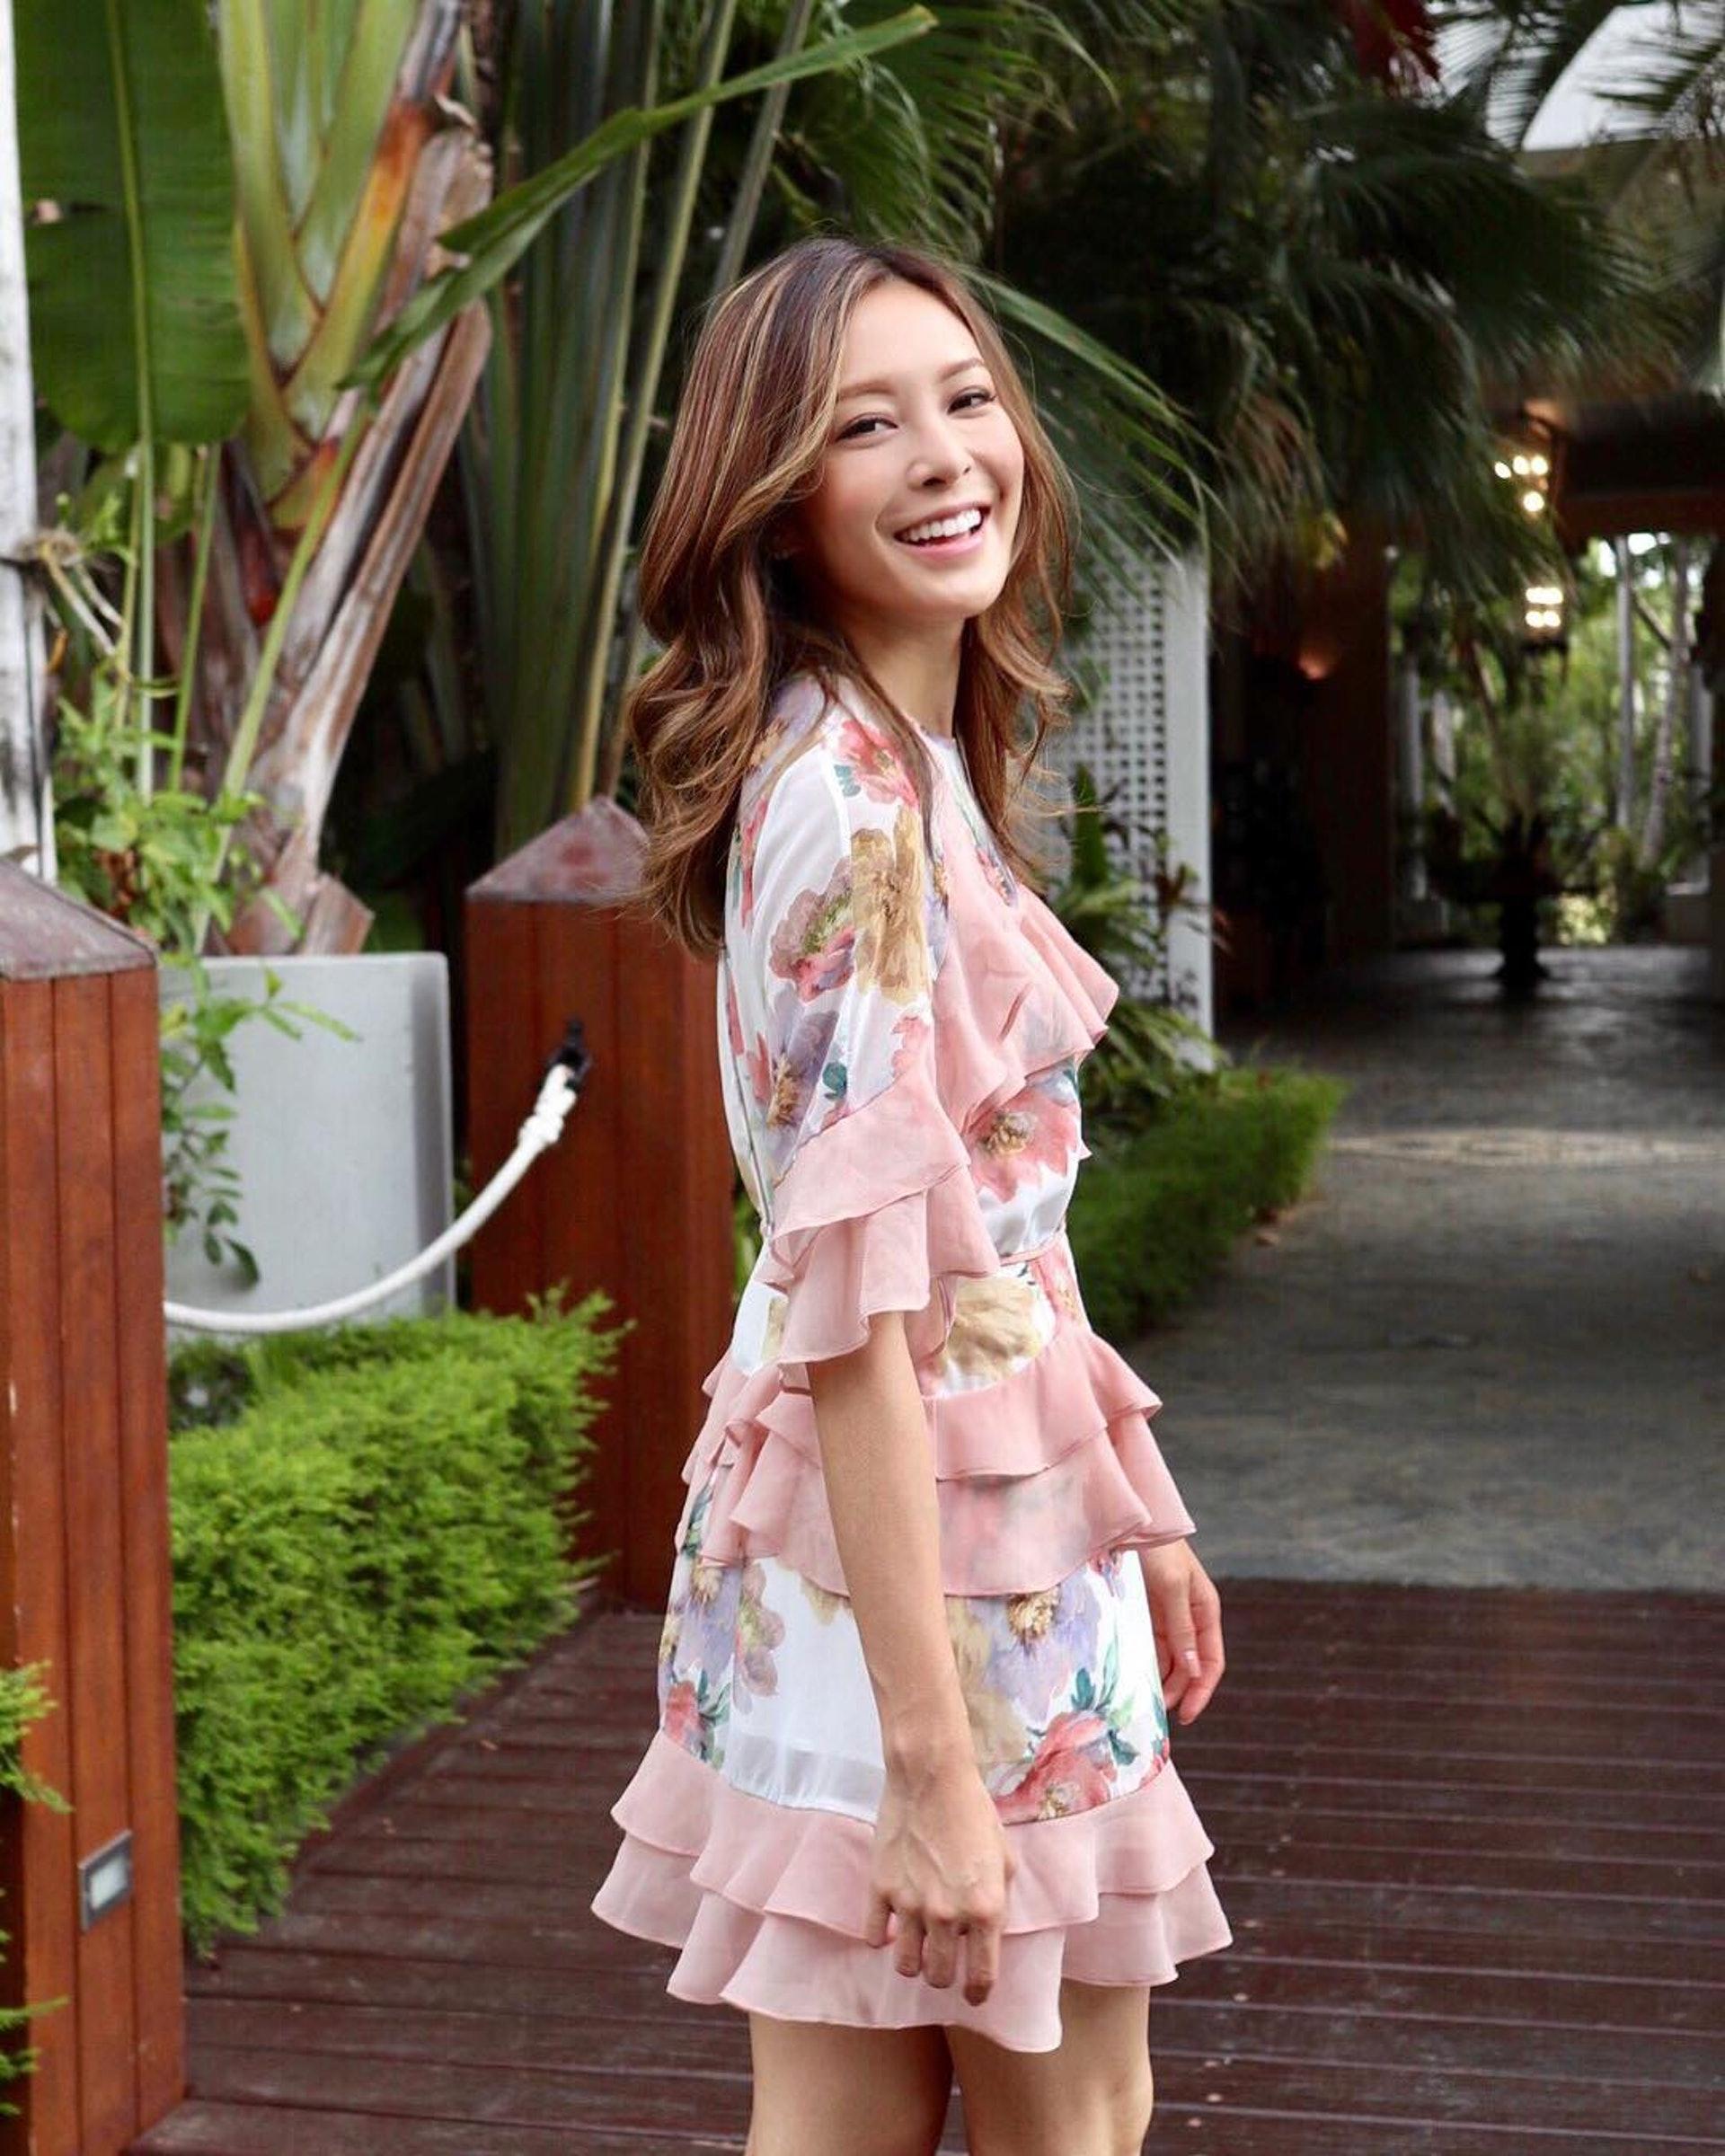 張曦雯(Kelly)熱愛印花服裝。(kelllycheung@Instagram)